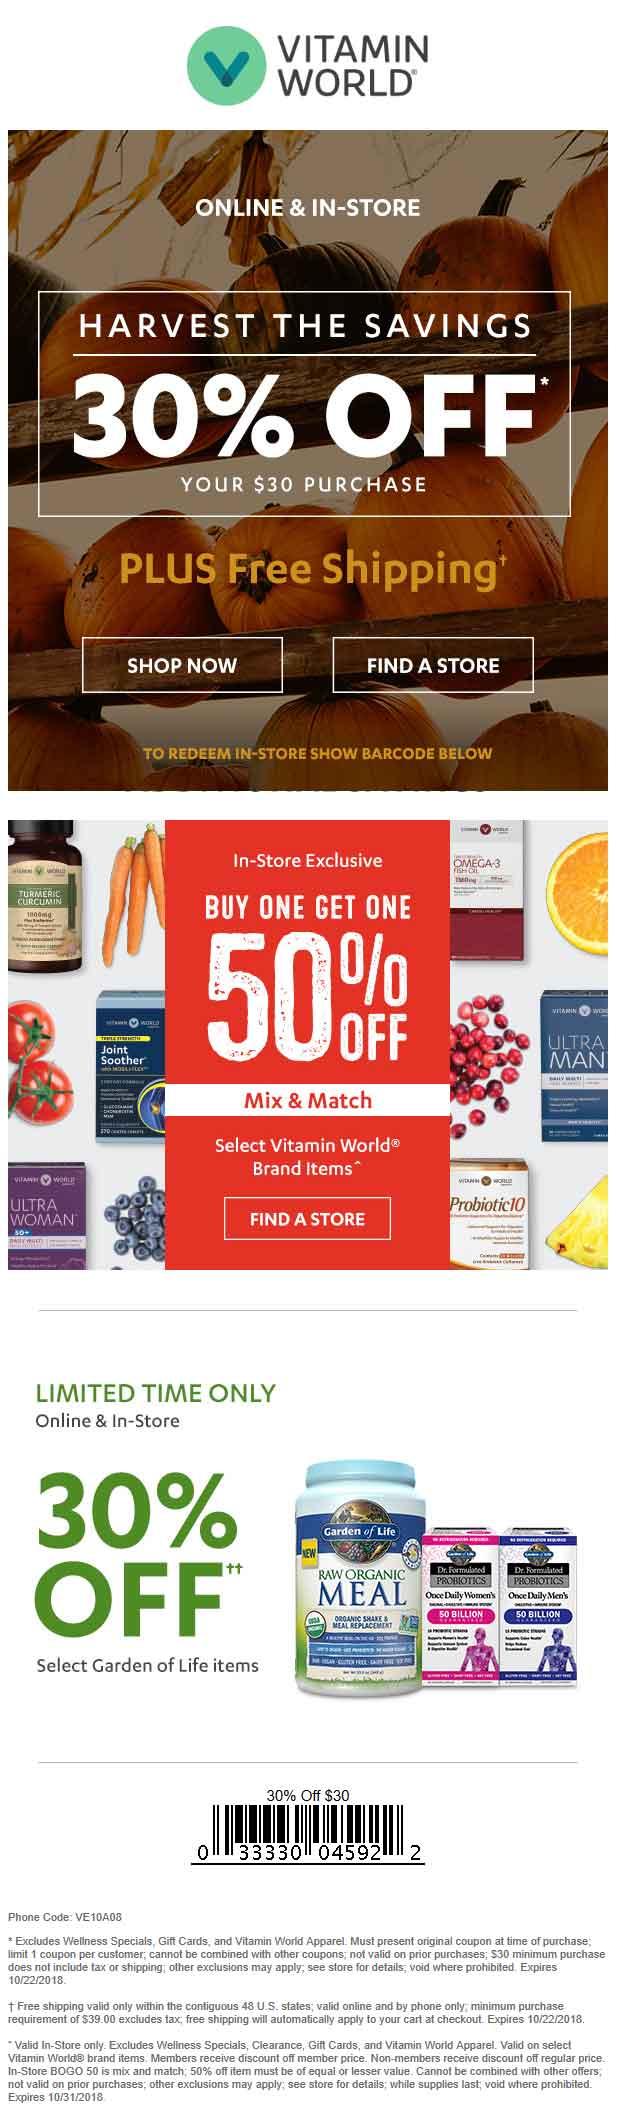 Vitamin World Coupon September 2019 30% off $30 at Vitamin World, or online via promo code VE10A08